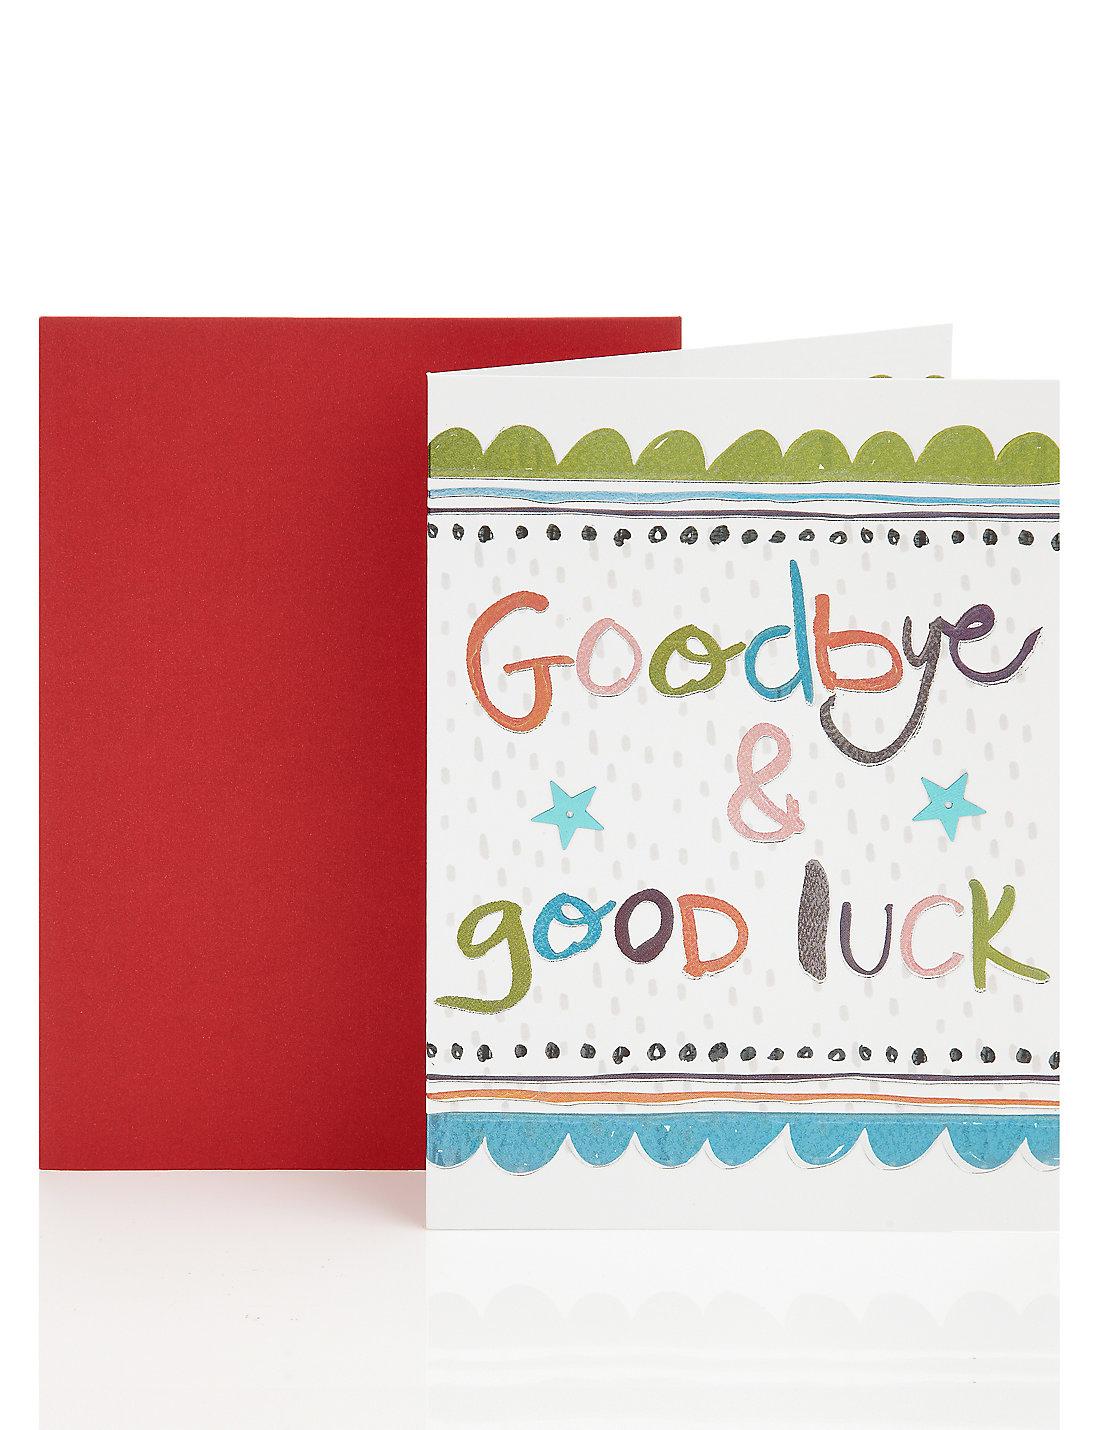 Goodbye good luck greetings card ms goodbye good luck greetings card kristyandbryce Image collections